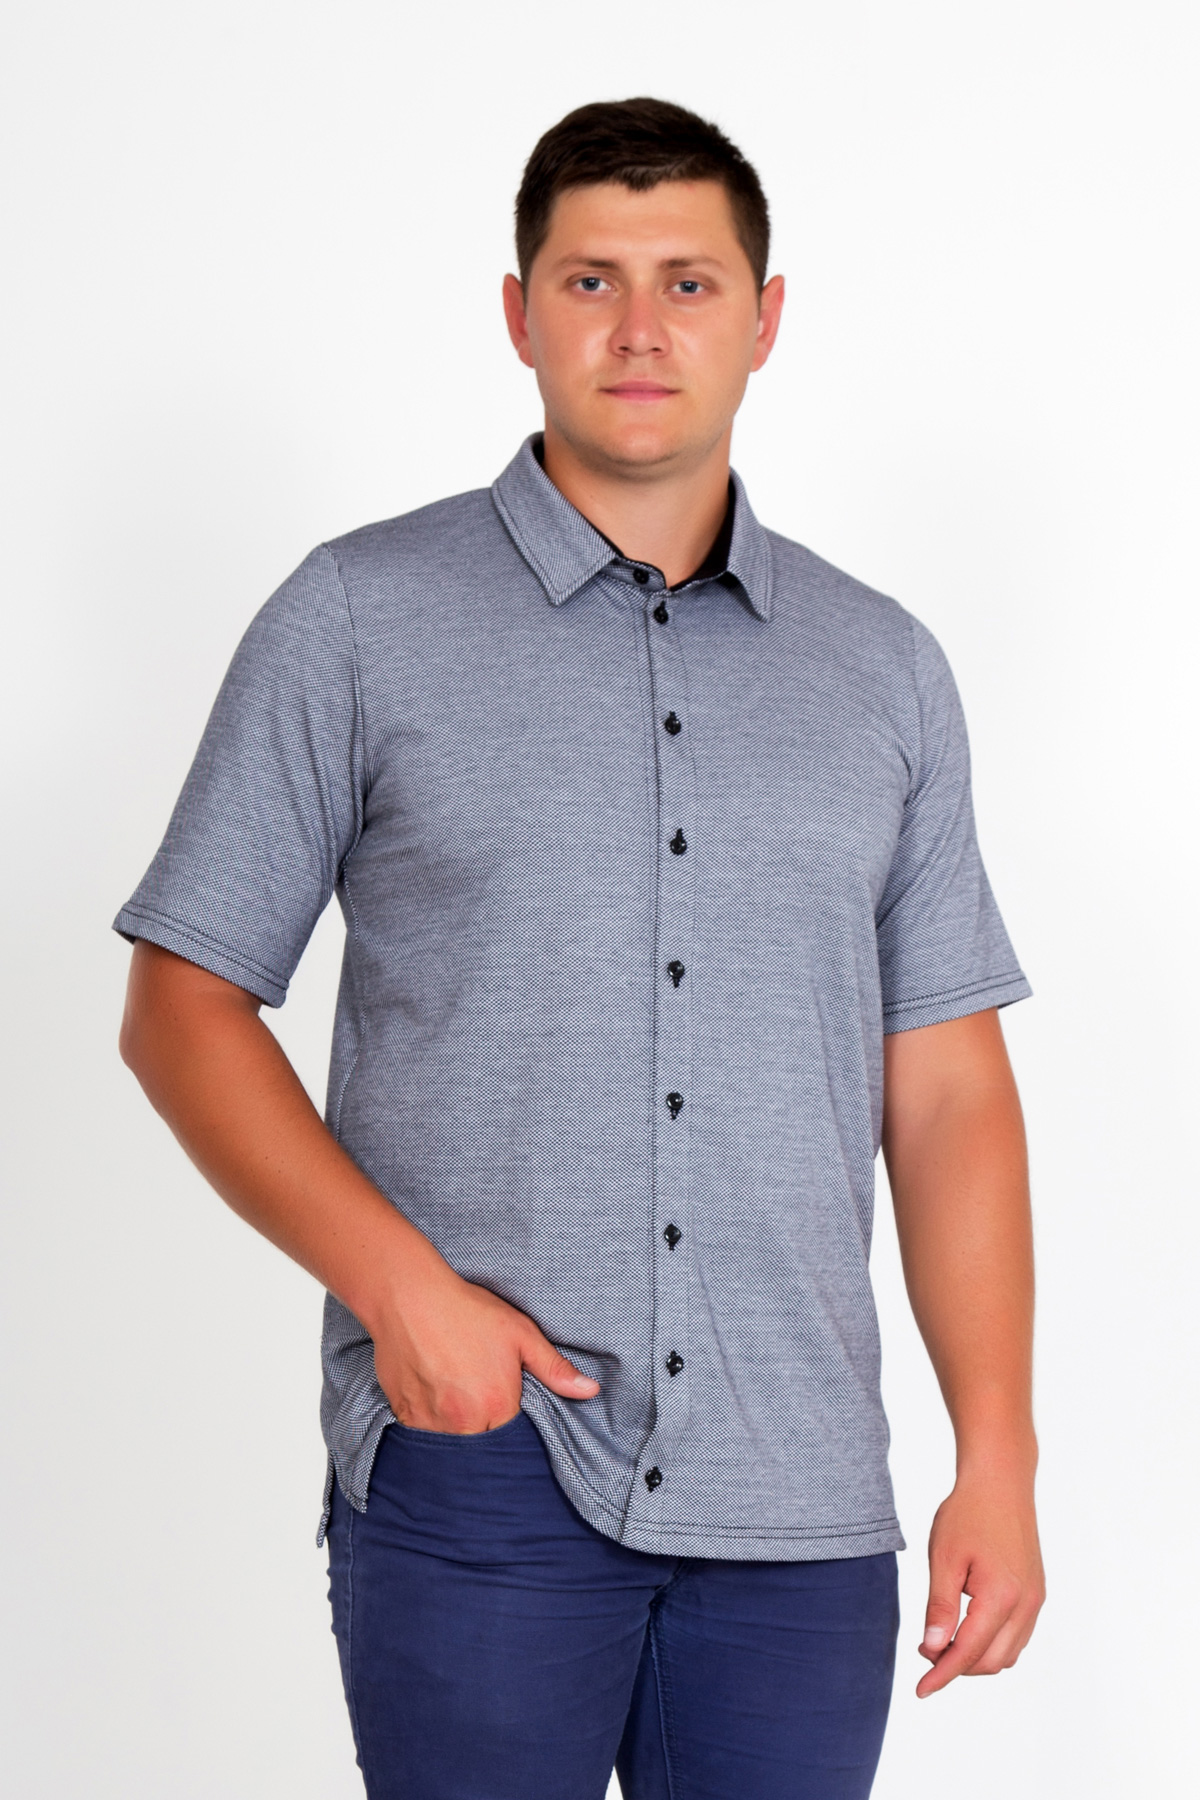 Муж. рубашка Аскольд р. 68Рубашки<br><br><br>Тип: Муж. рубашка<br>Размер: 68<br>Материал: Трикотаж